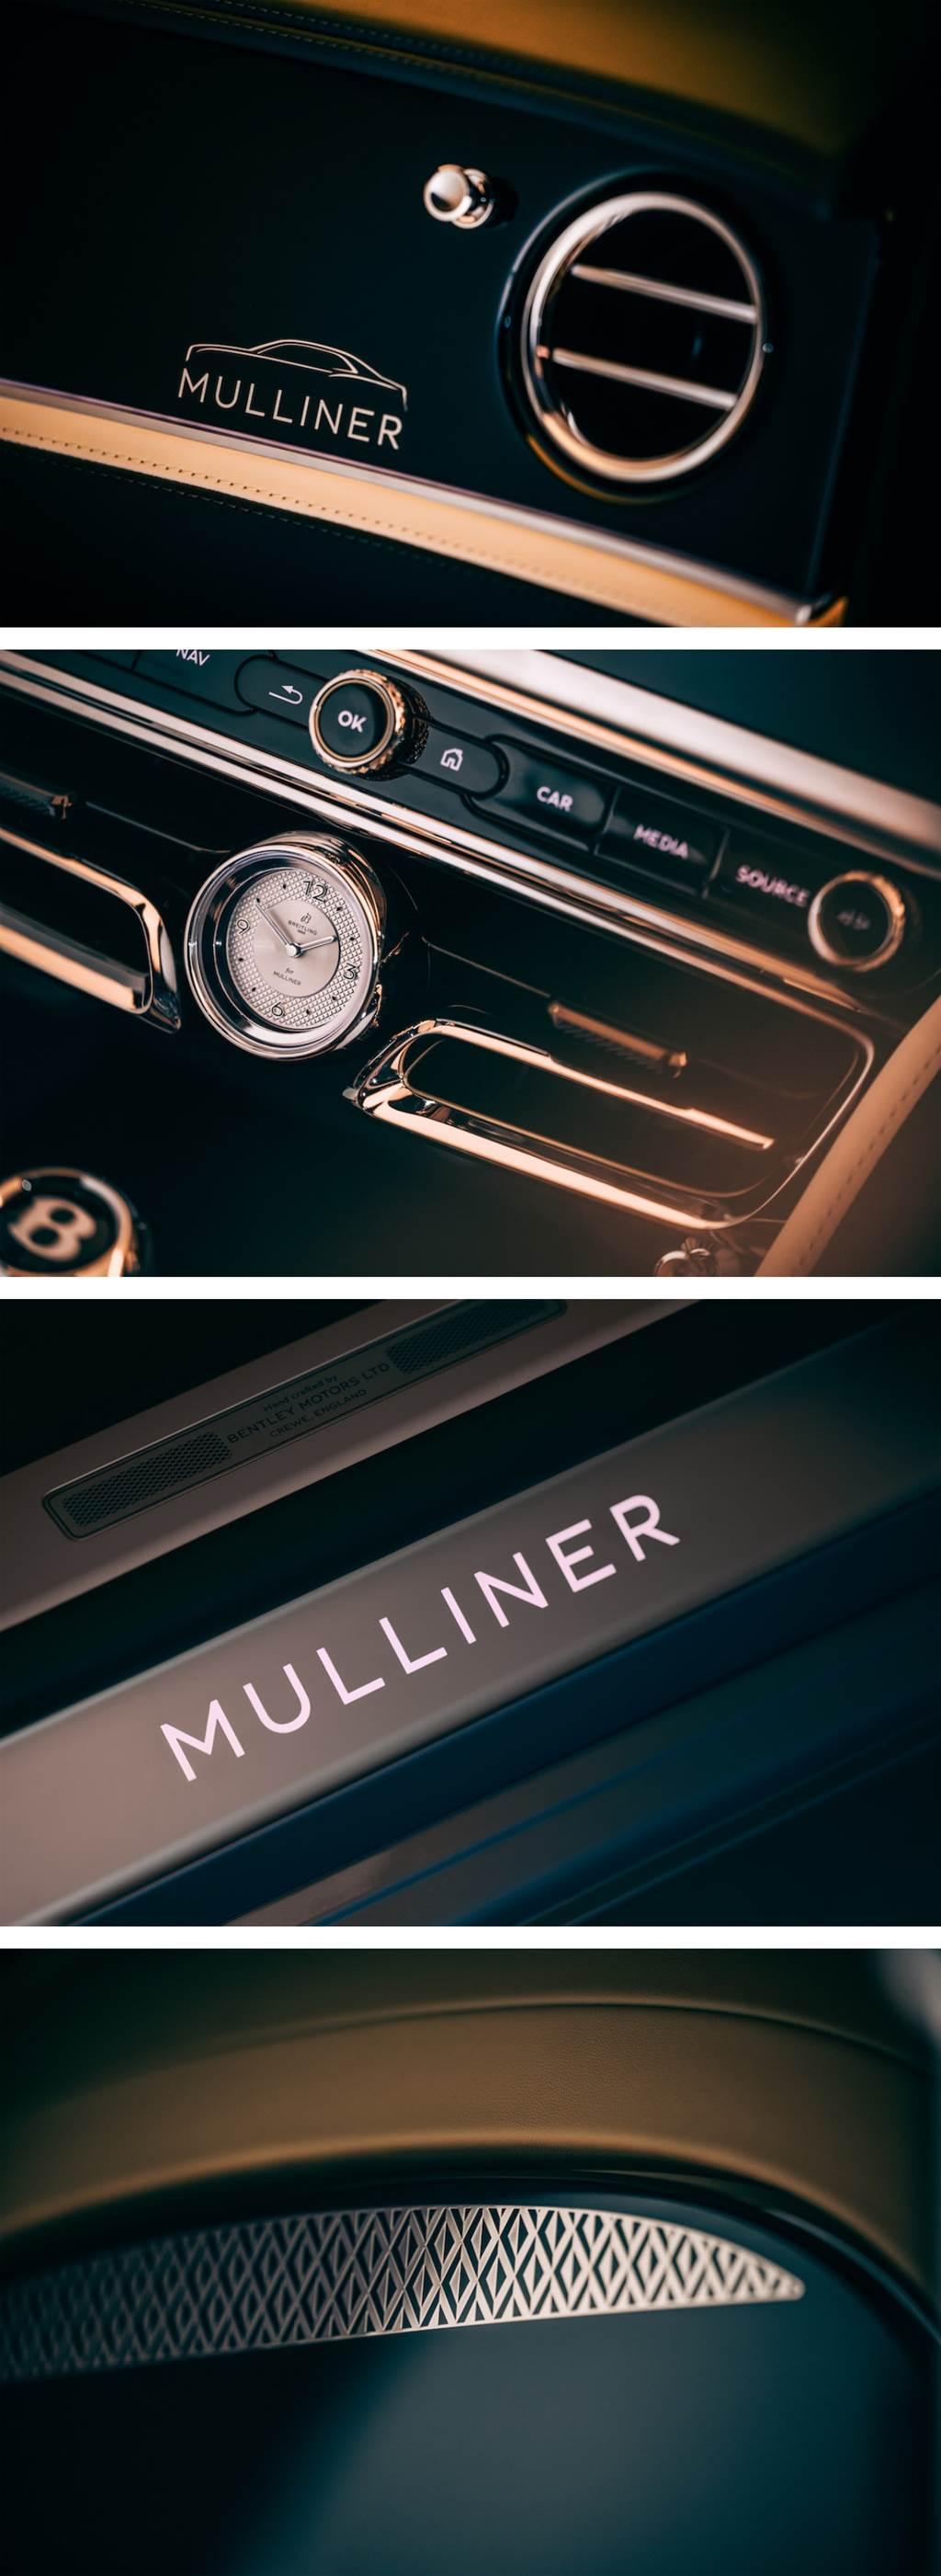 Mulliner車型團隊的第三款力作 Bentley Flying Spur Mulliner亮相(圖/CarStuff)